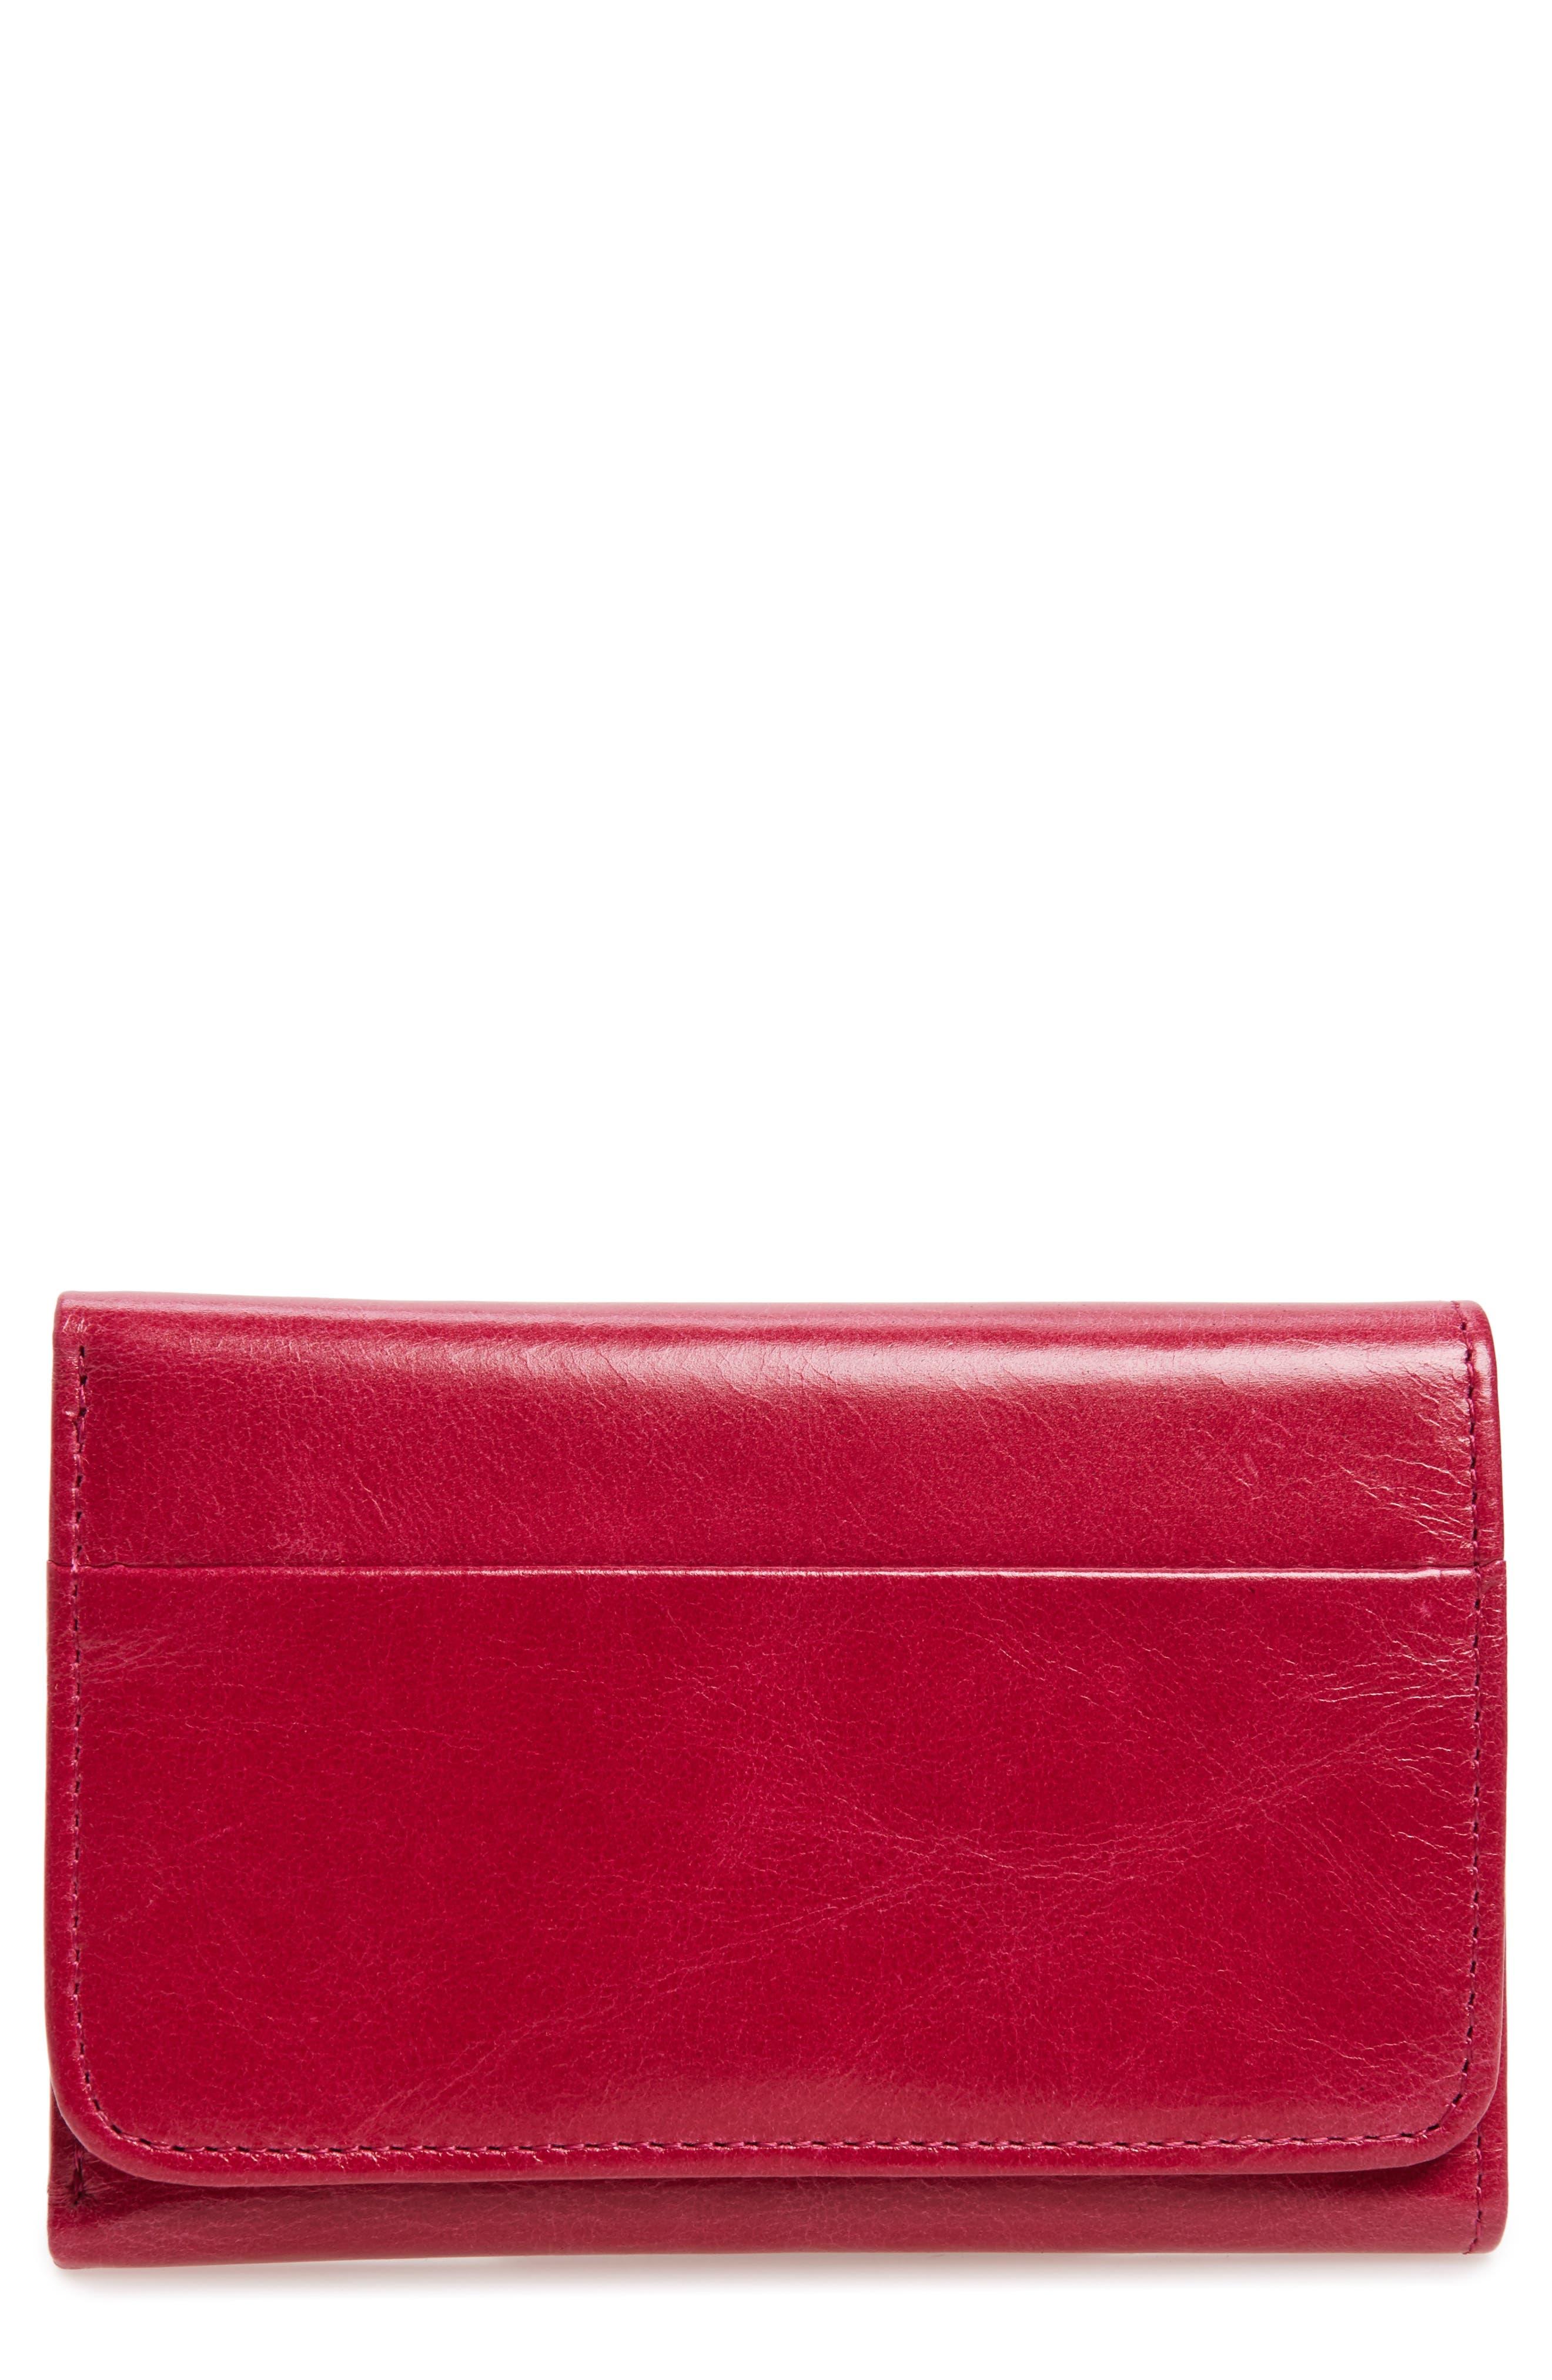 Alternate Image 1 Selected - Hobo 'Jill' Trifold Wallet